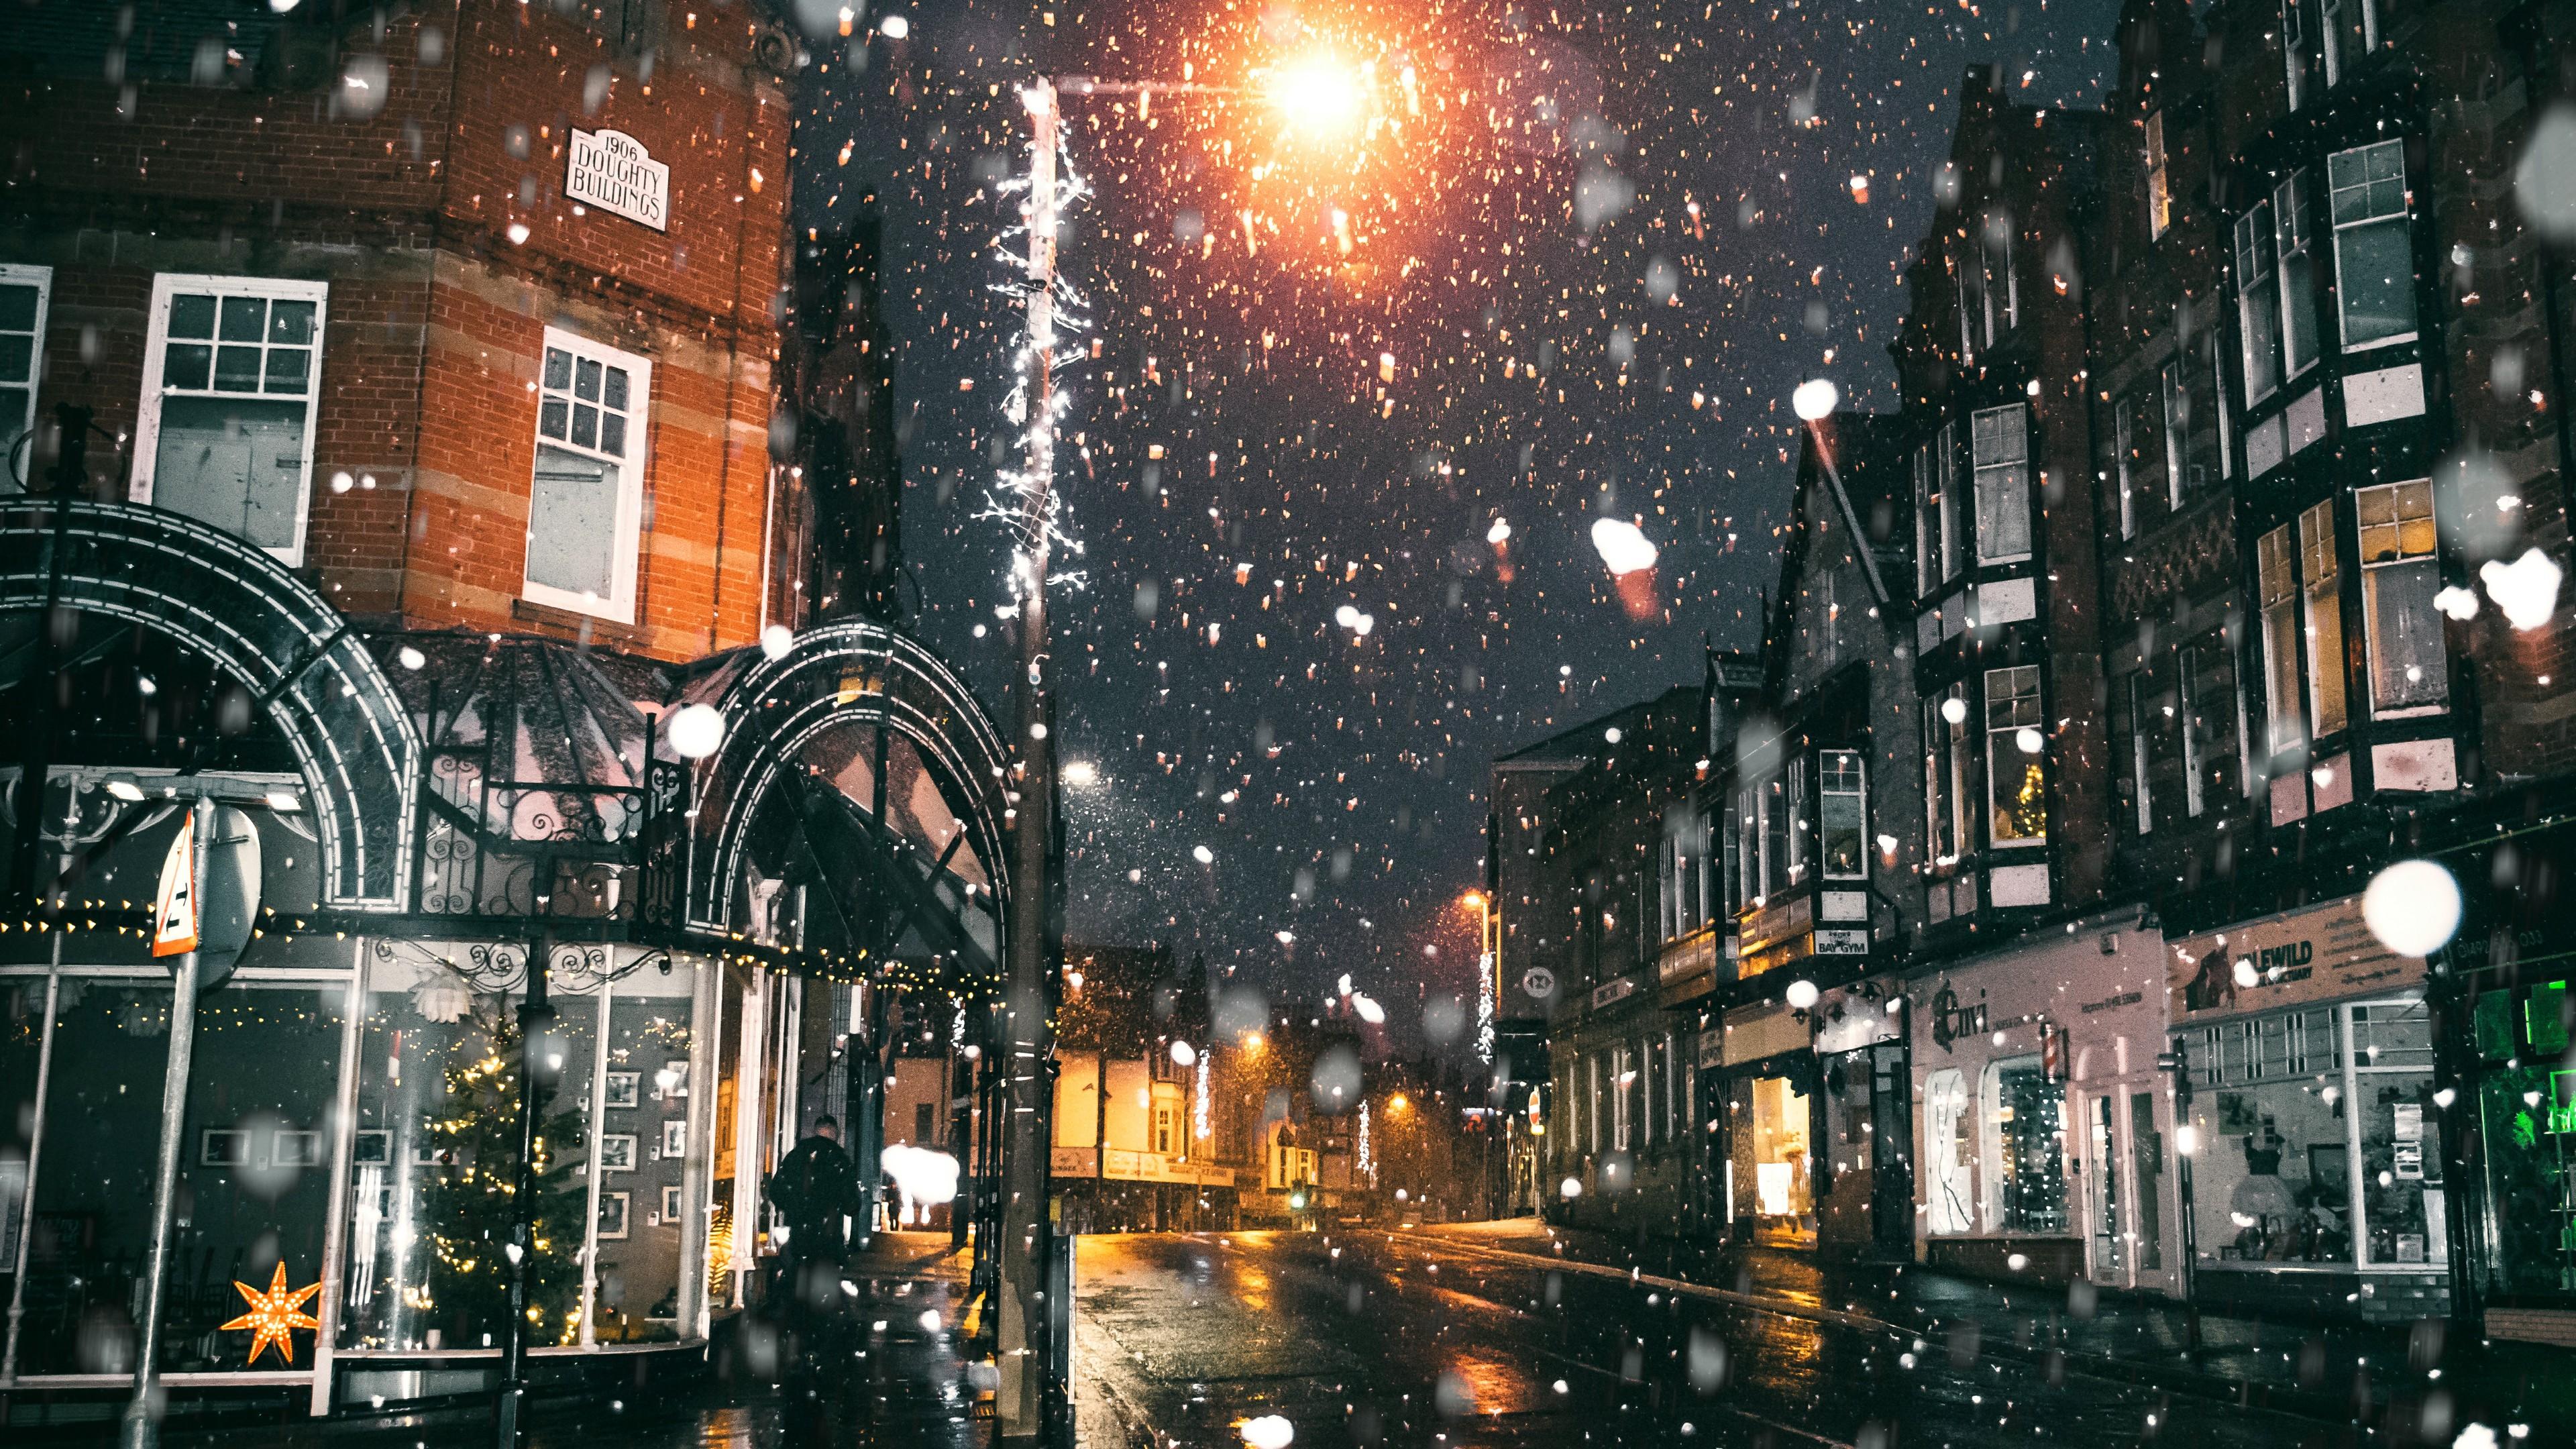 Snowfall in a town wallpaper